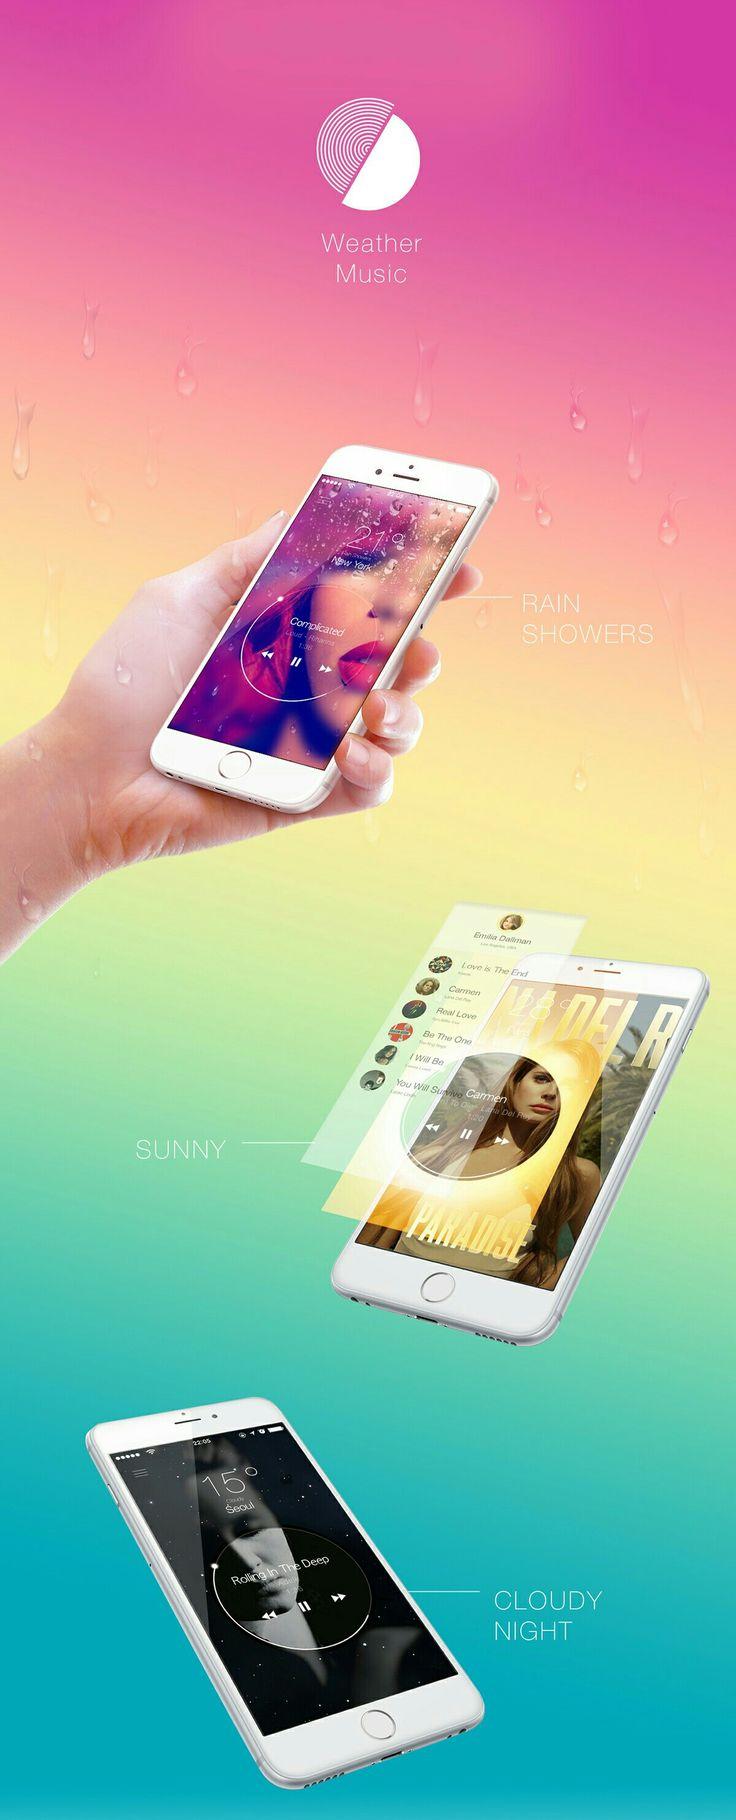 Weather music app